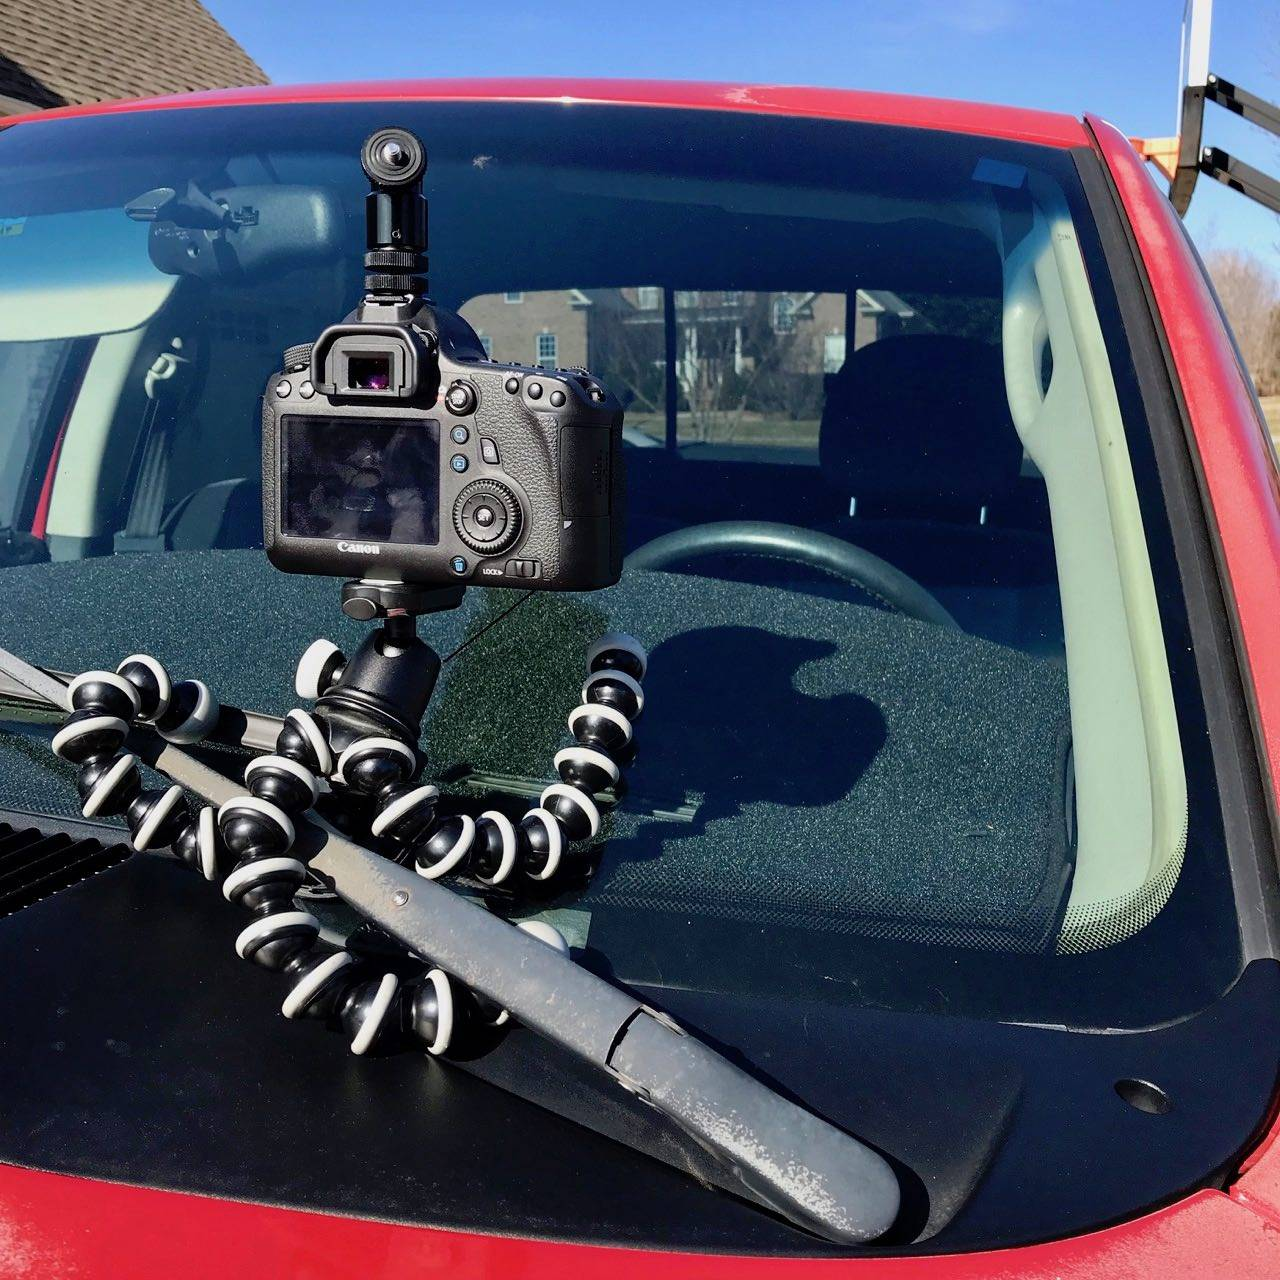 GorillaPod wrapped around vehicle's windshield wiper.